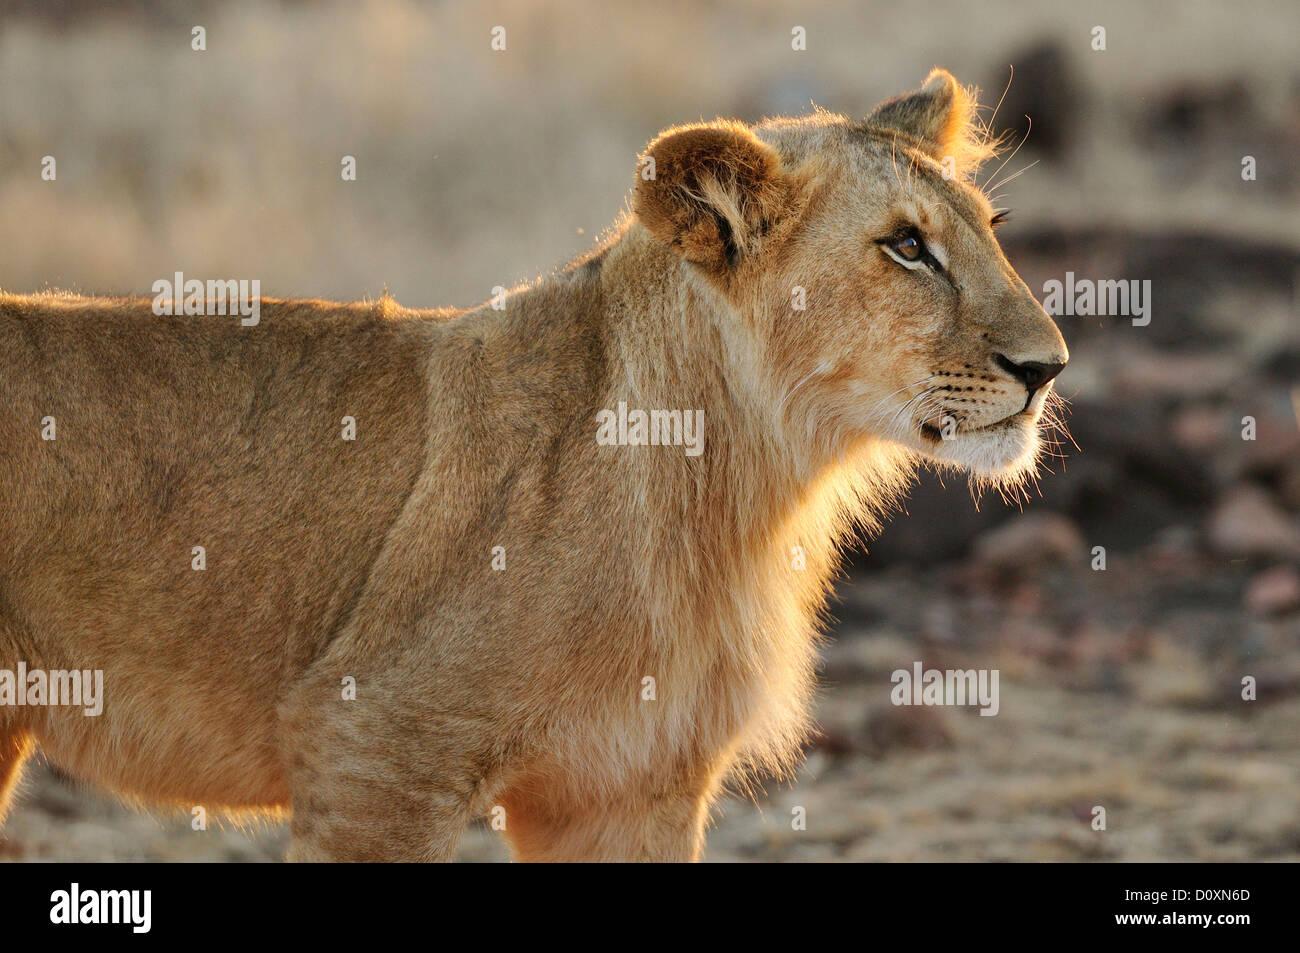 África, Zimbabwe, Victoria Falls, León, León, animal Imagen De Stock